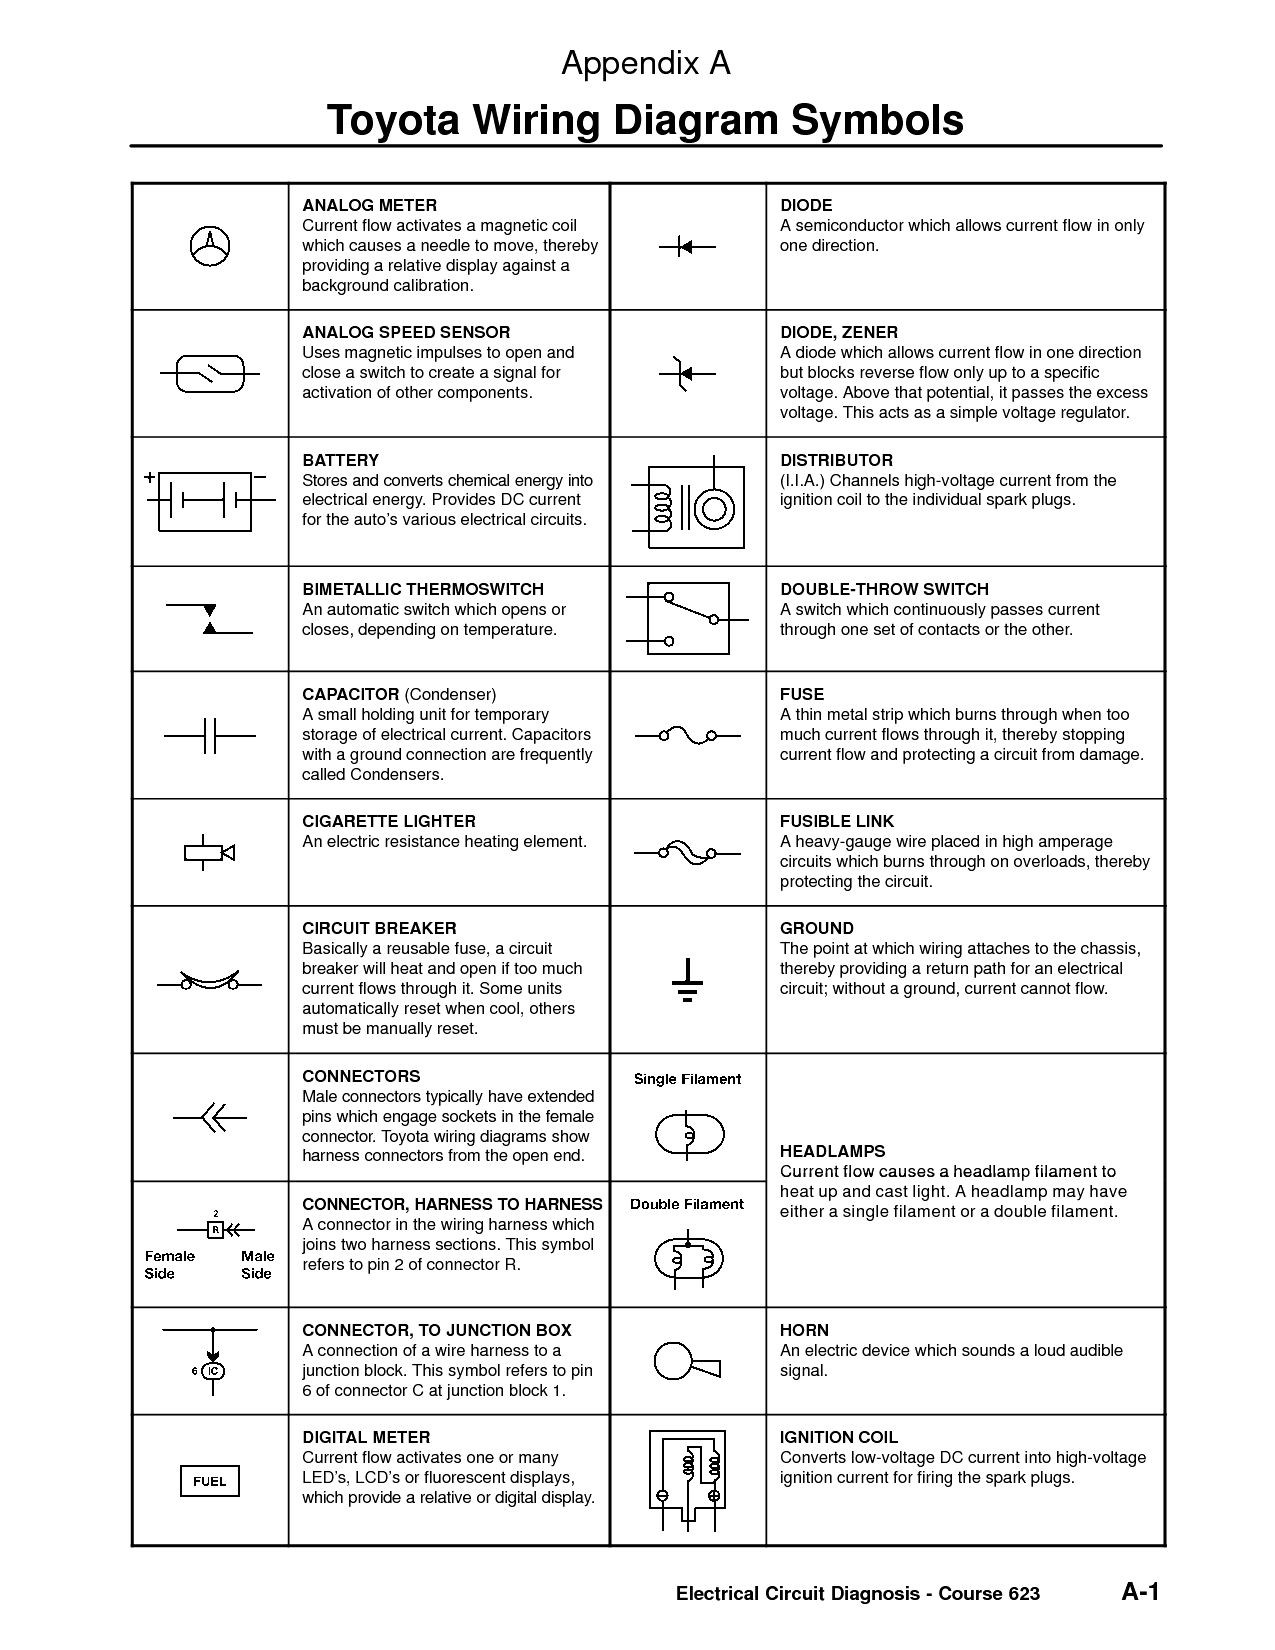 Terrific Electrical Diagram Key Unique Wiring Diagram Symbol Key Box Wiring Wiring Cloud Domeilariaidewilluminateatxorg